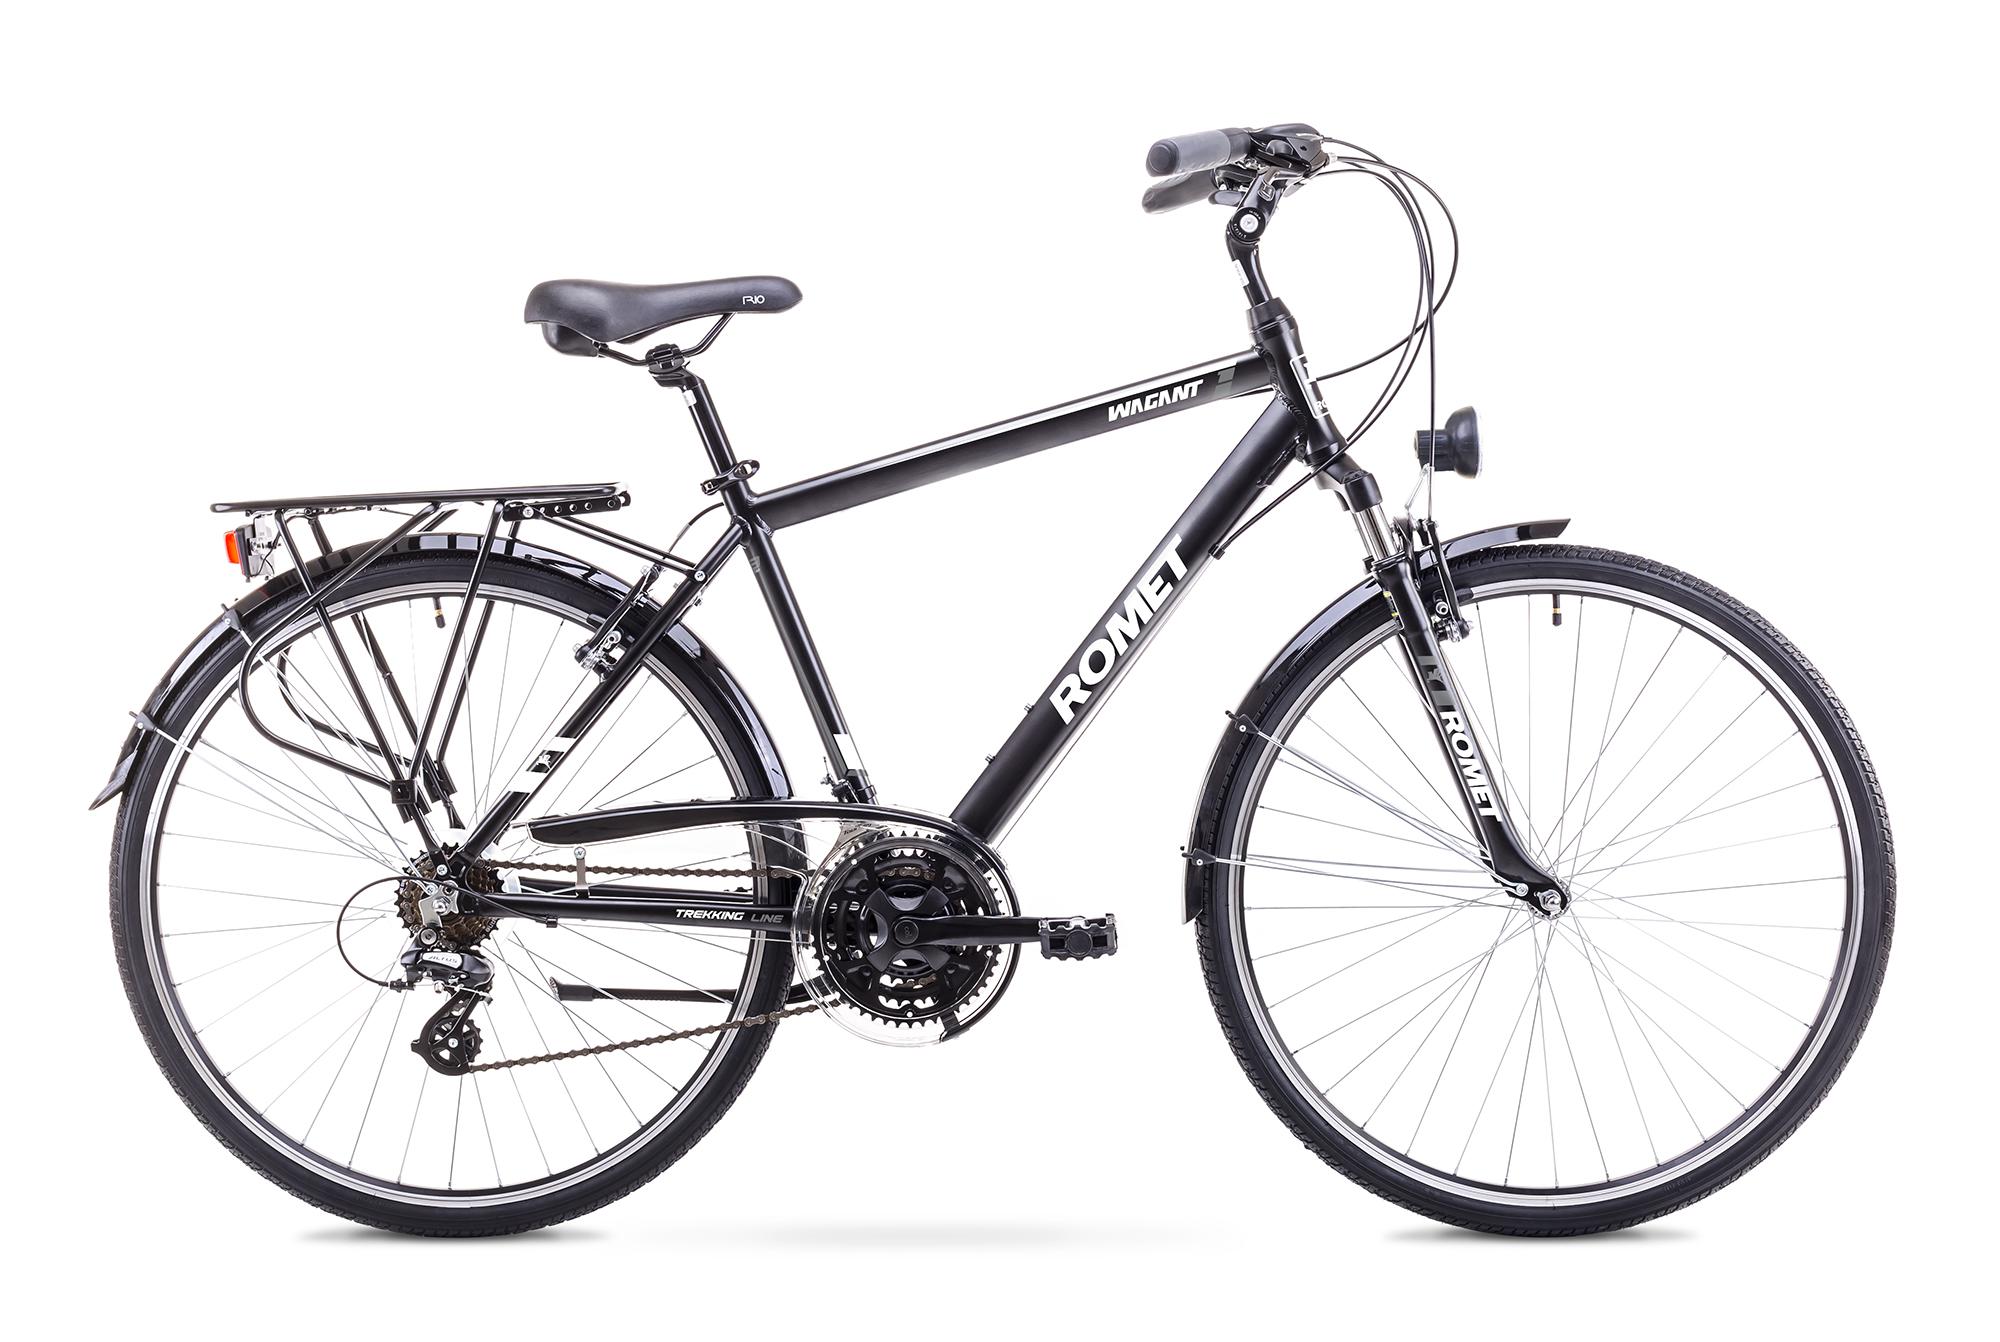 Bicicleta de trekking/oras pentru Barbati Romet WAGANT 1 LIMITED Negru/Alb 2018 Romet